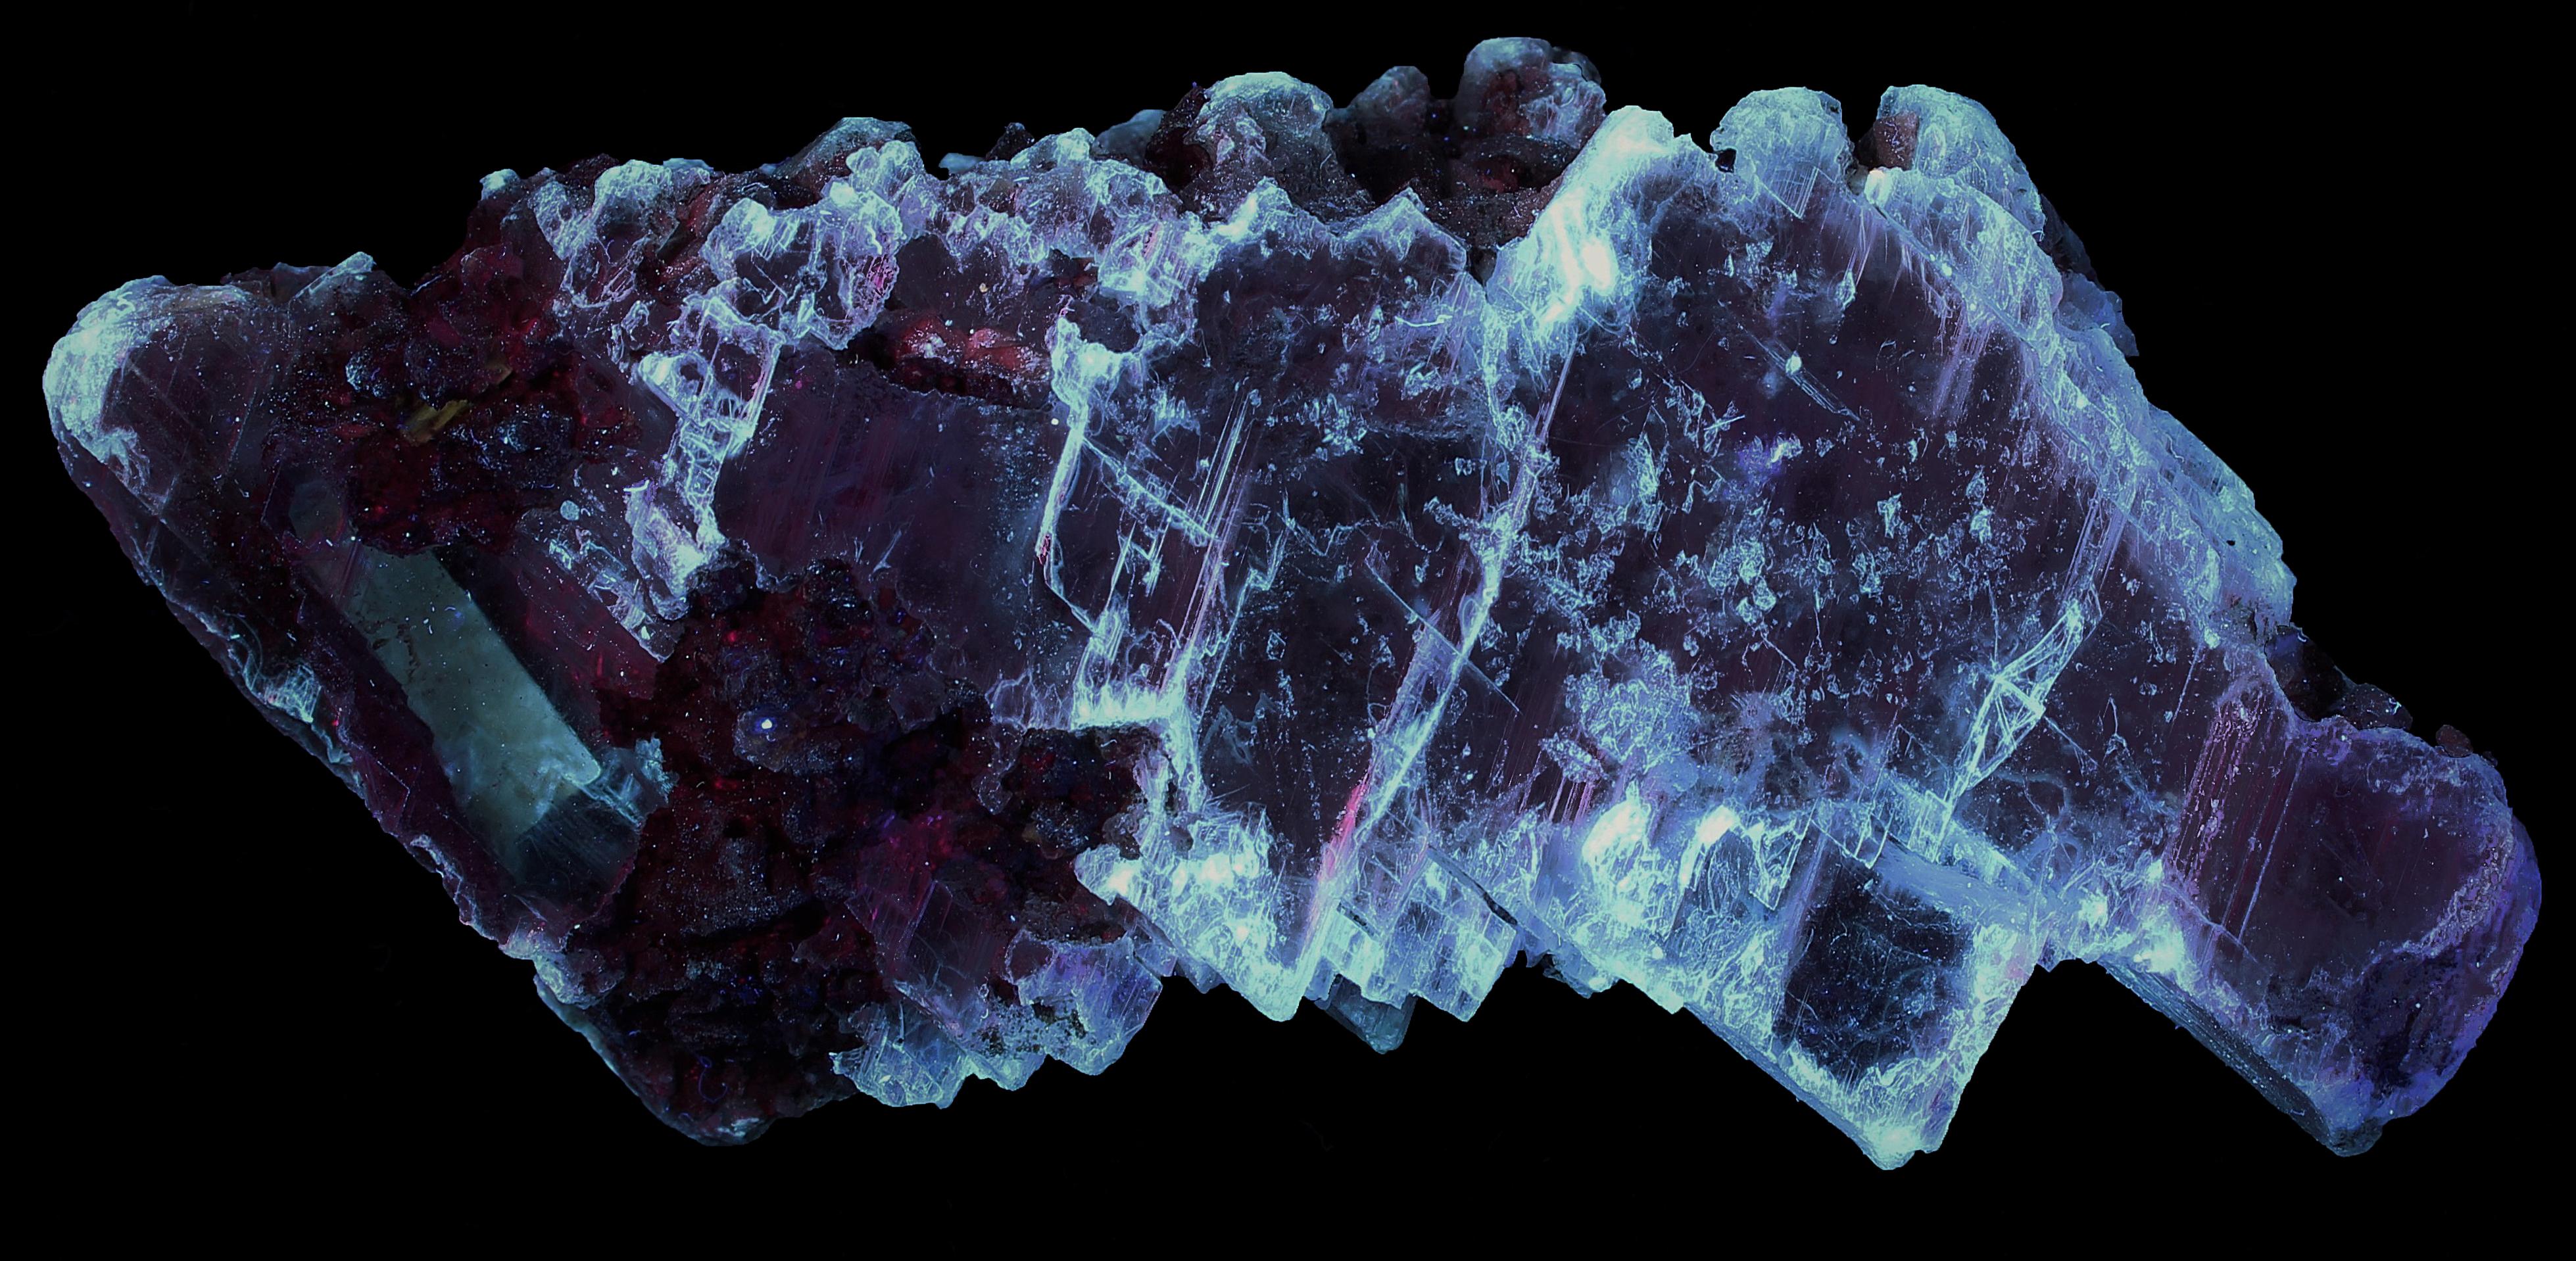 Gypsum (selenite), franklinite and calcite from the Sterling Hill Mine, NJ under longwave UV Light